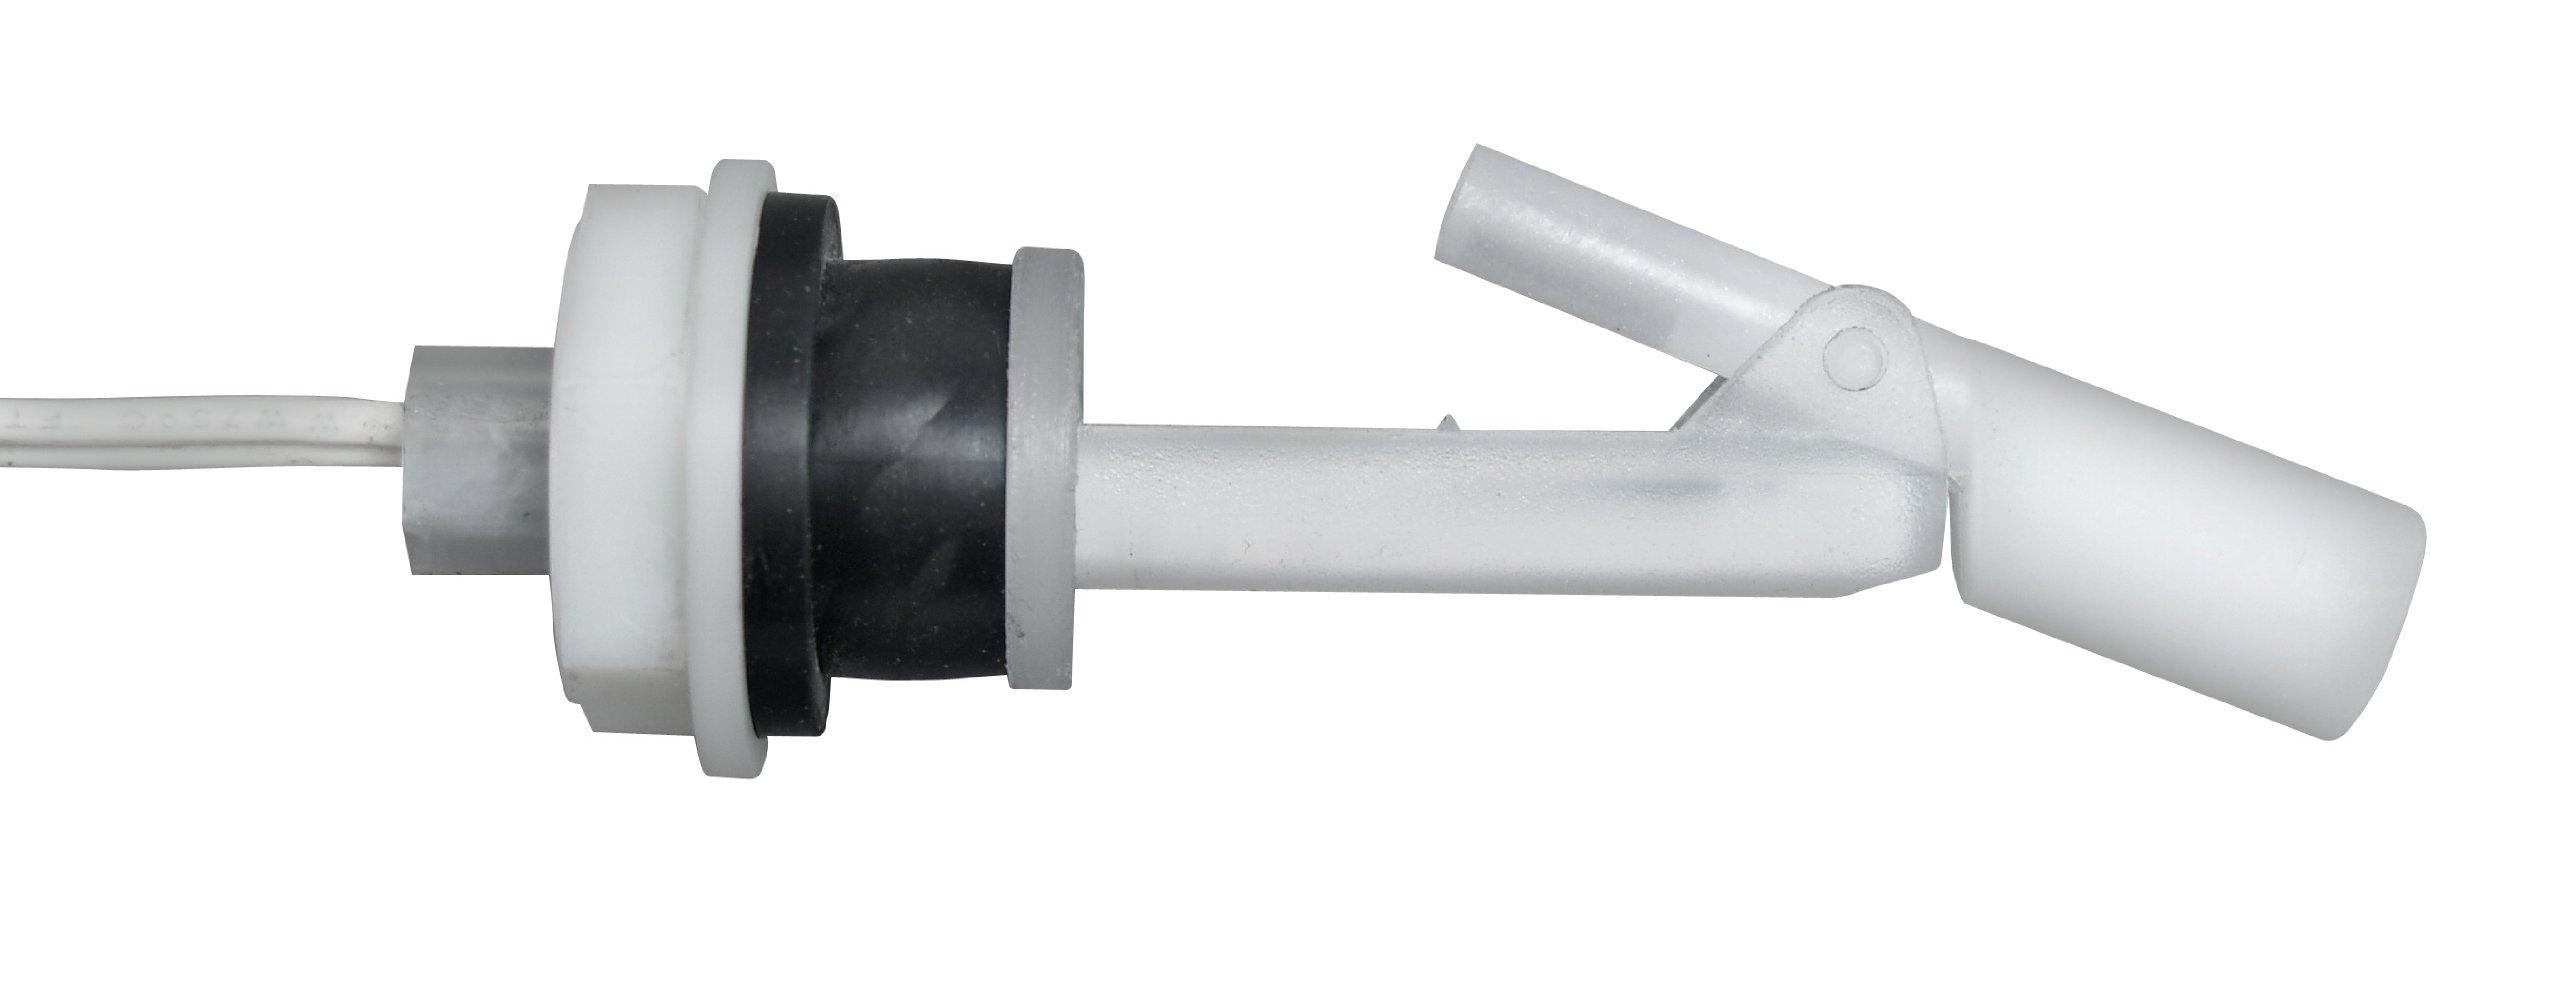 Madison M8790-14/4184 Plastic Side-Mounted Liquid Level Float Switch with Polypropylene Stem and Nitrile Compression Gasket, 30 VA SPST, 5/8-11 UNC, 100 psig Pressure